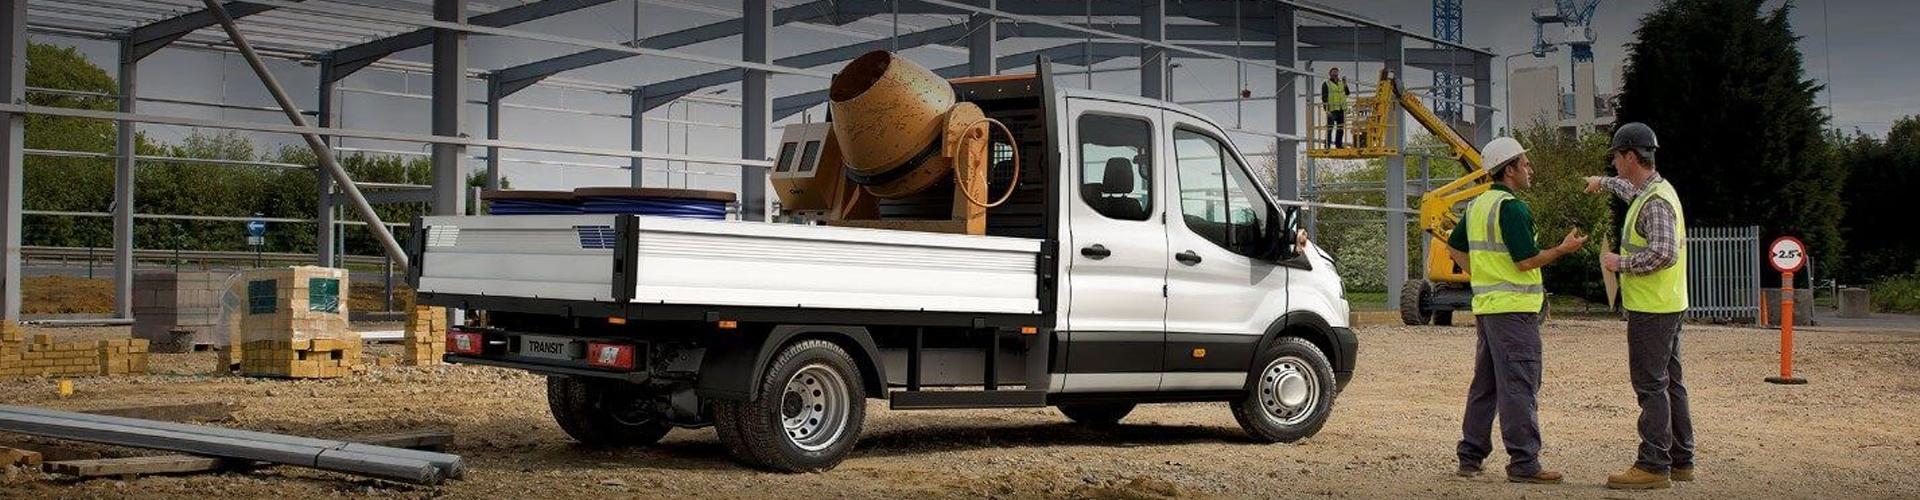 2021 ford transit kamyonet modelleri ve